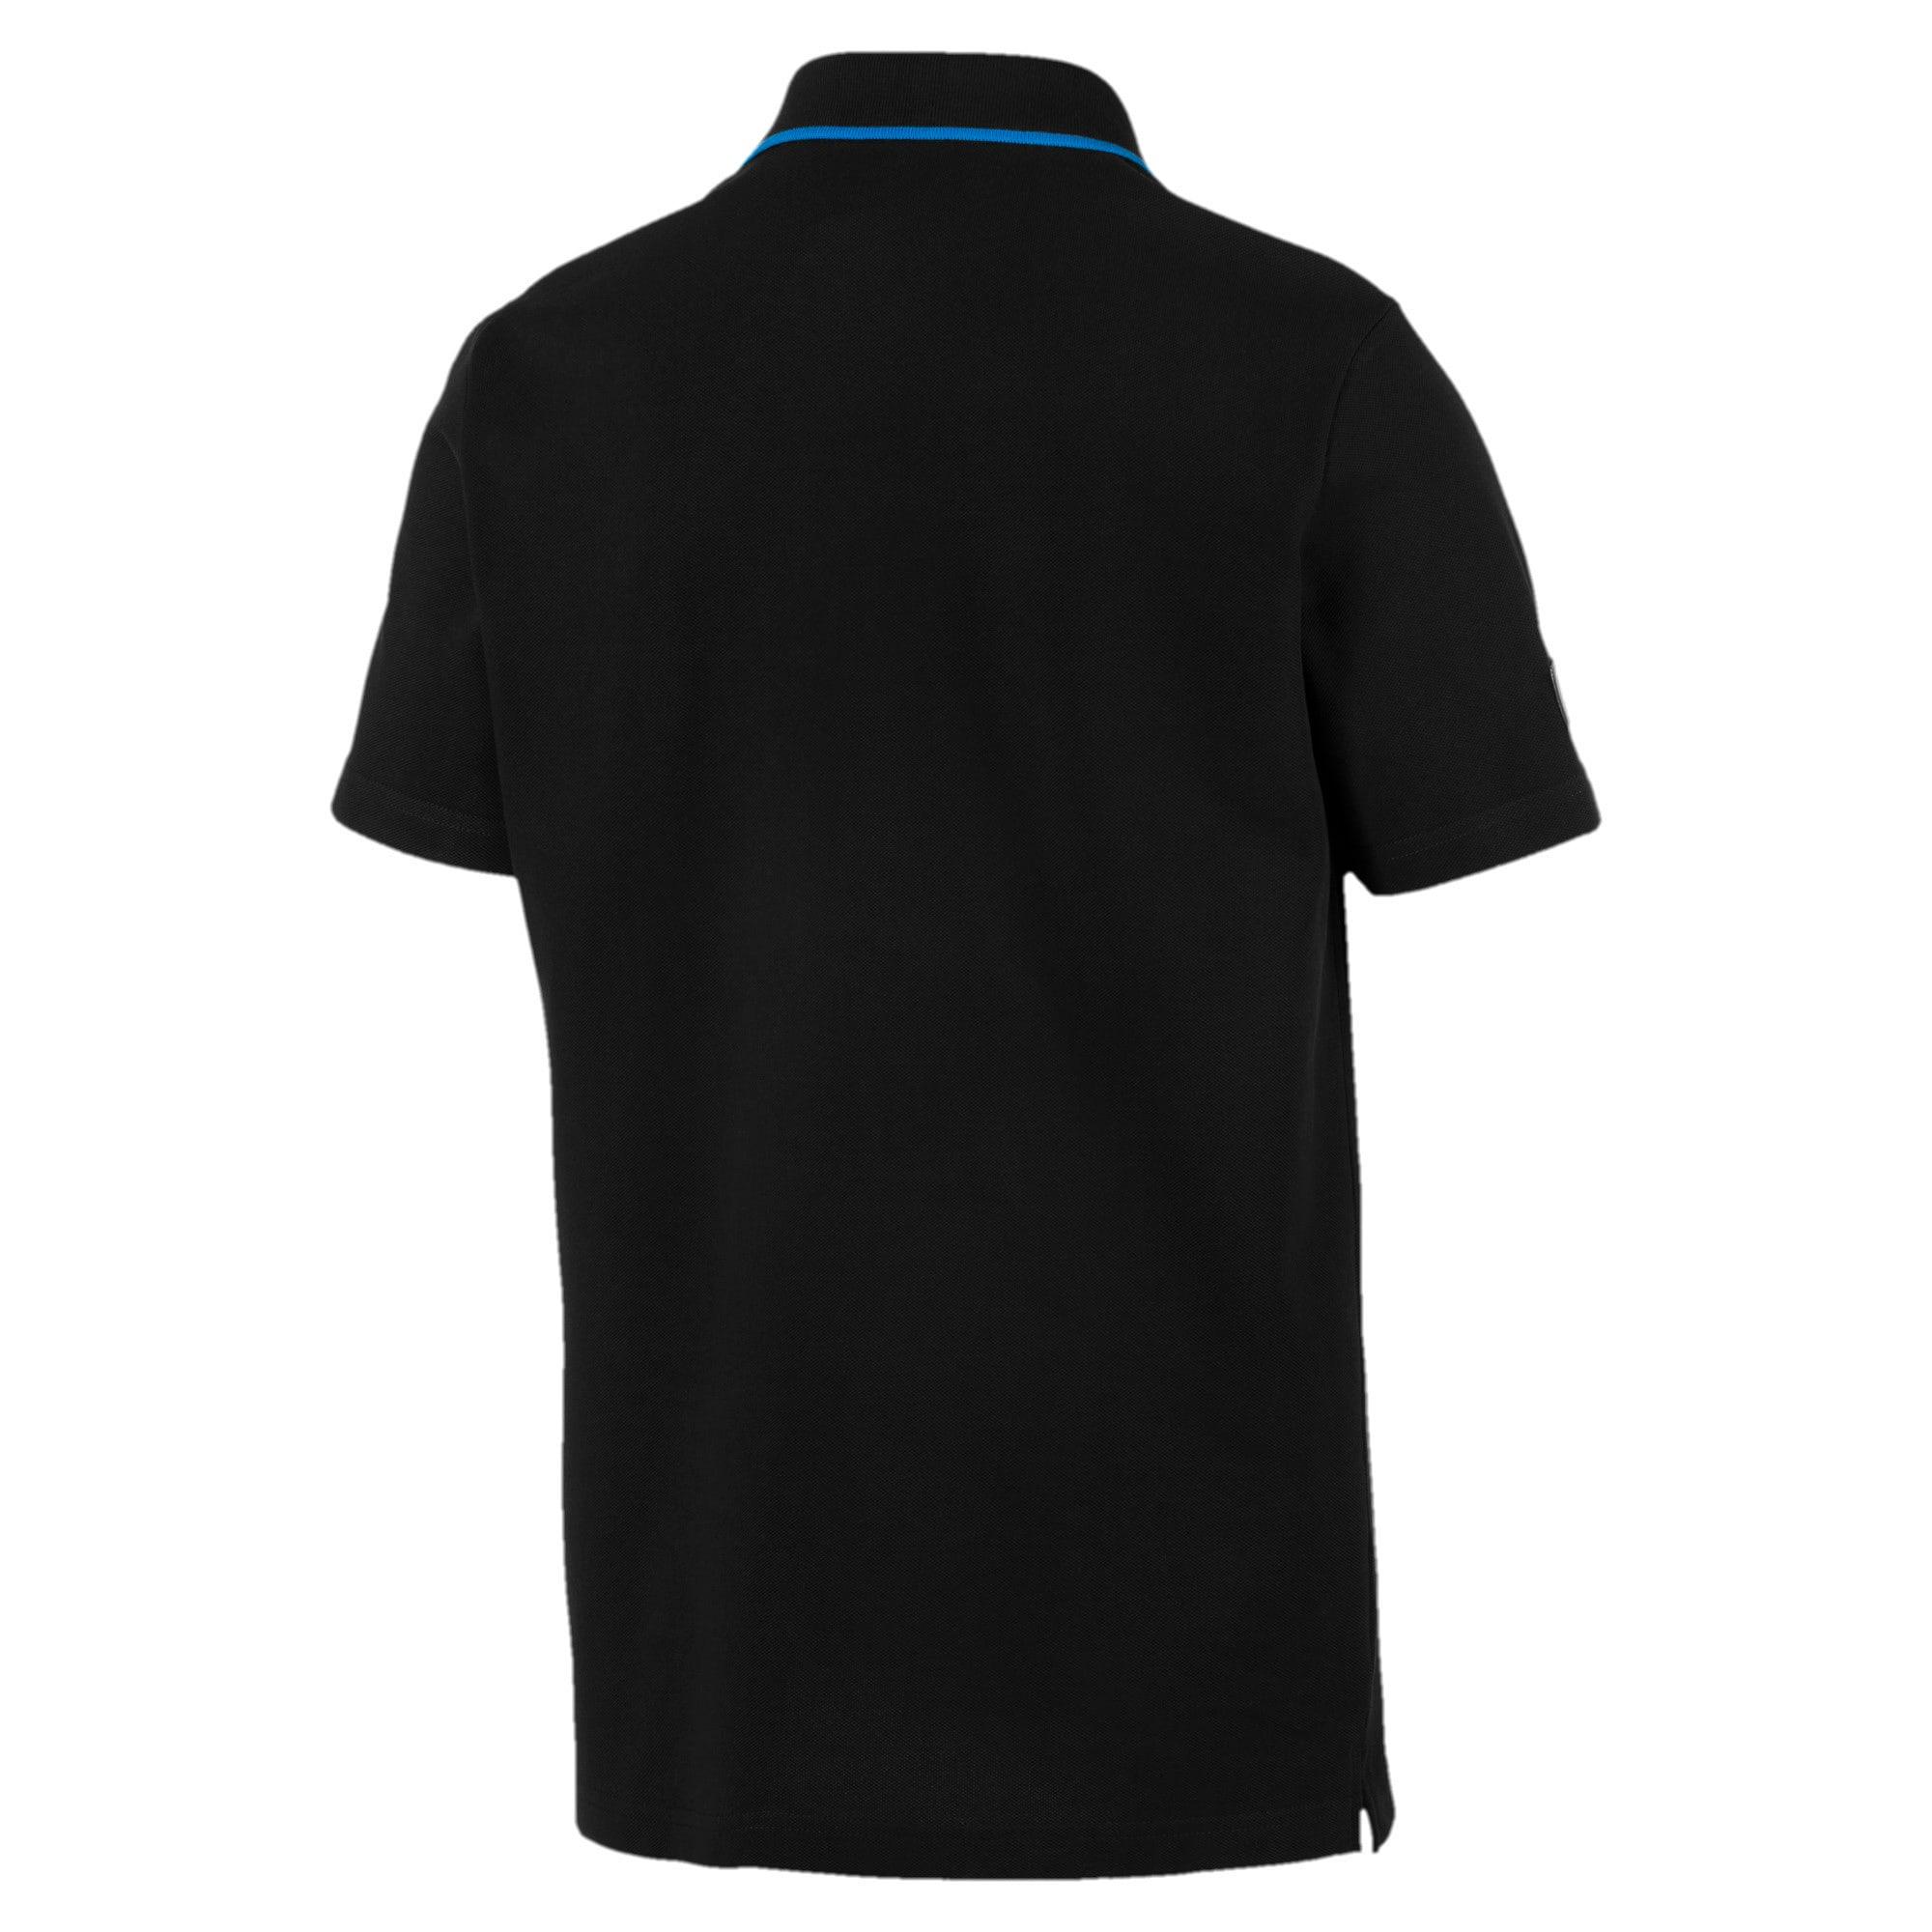 Thumbnail 4 of MERCEDES AMG PETRONAS Men's Polo Shirt, Puma Black, medium-IND